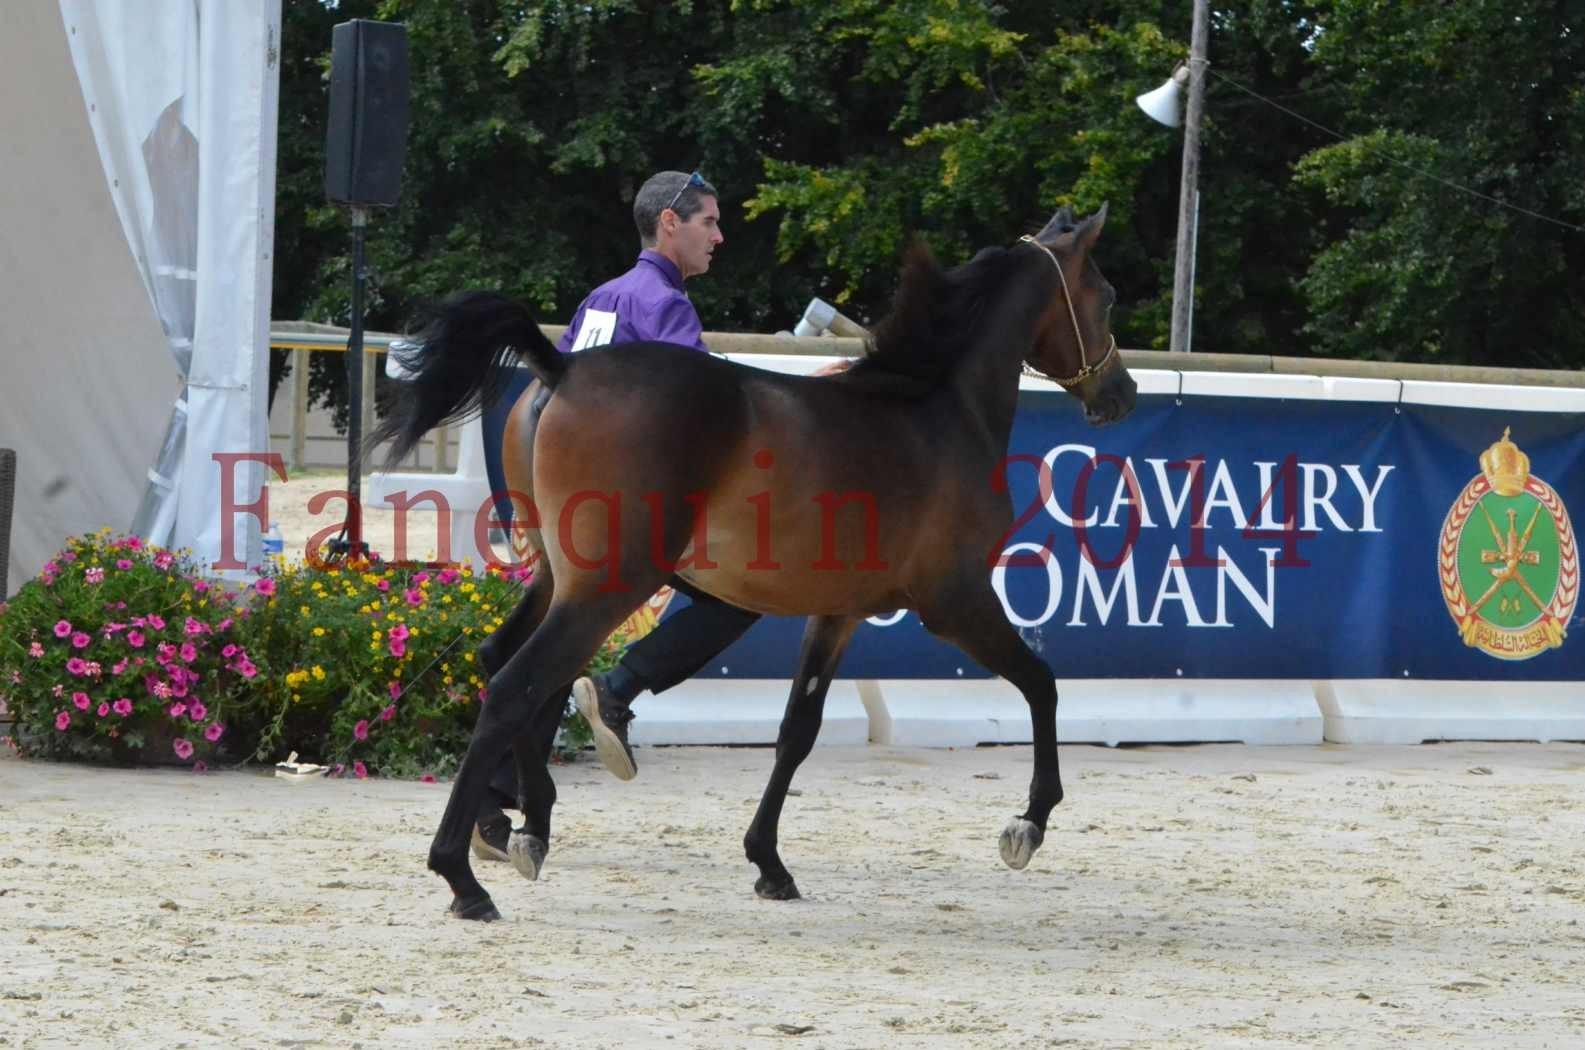 Championnat de FRANCE 2014 - Amateurs - SH FARAJAA - 20